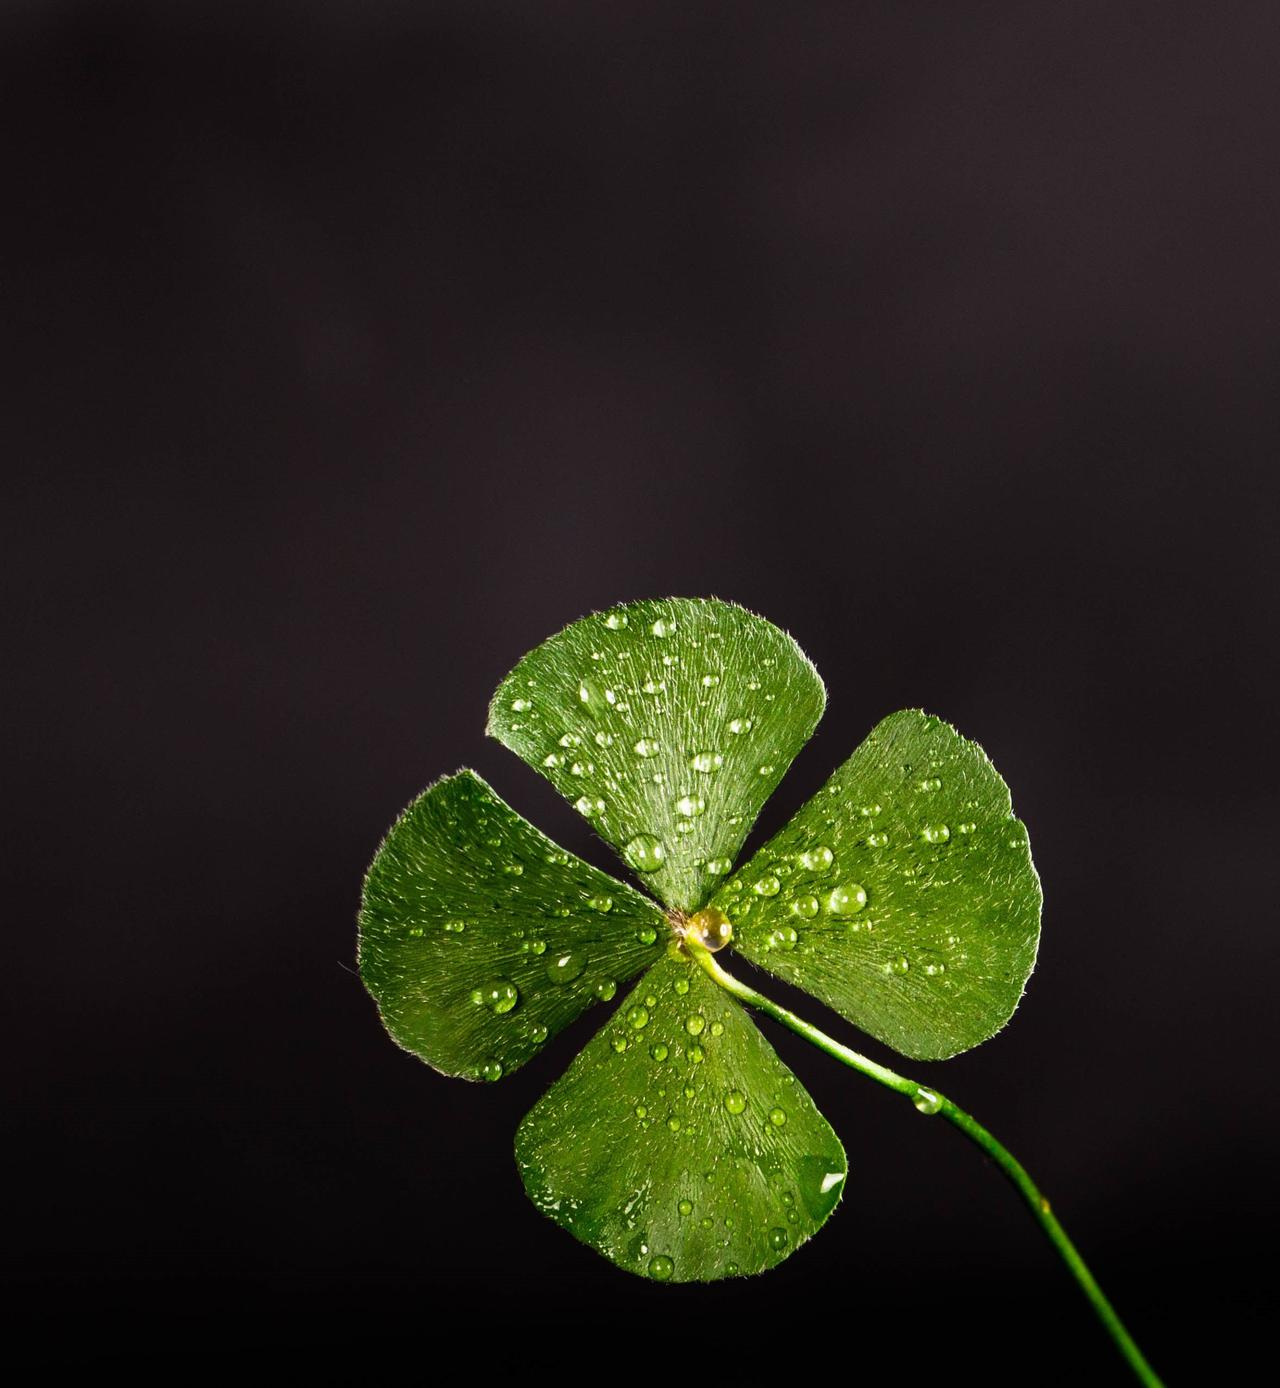 clover-dew-leaf-705310.jpg